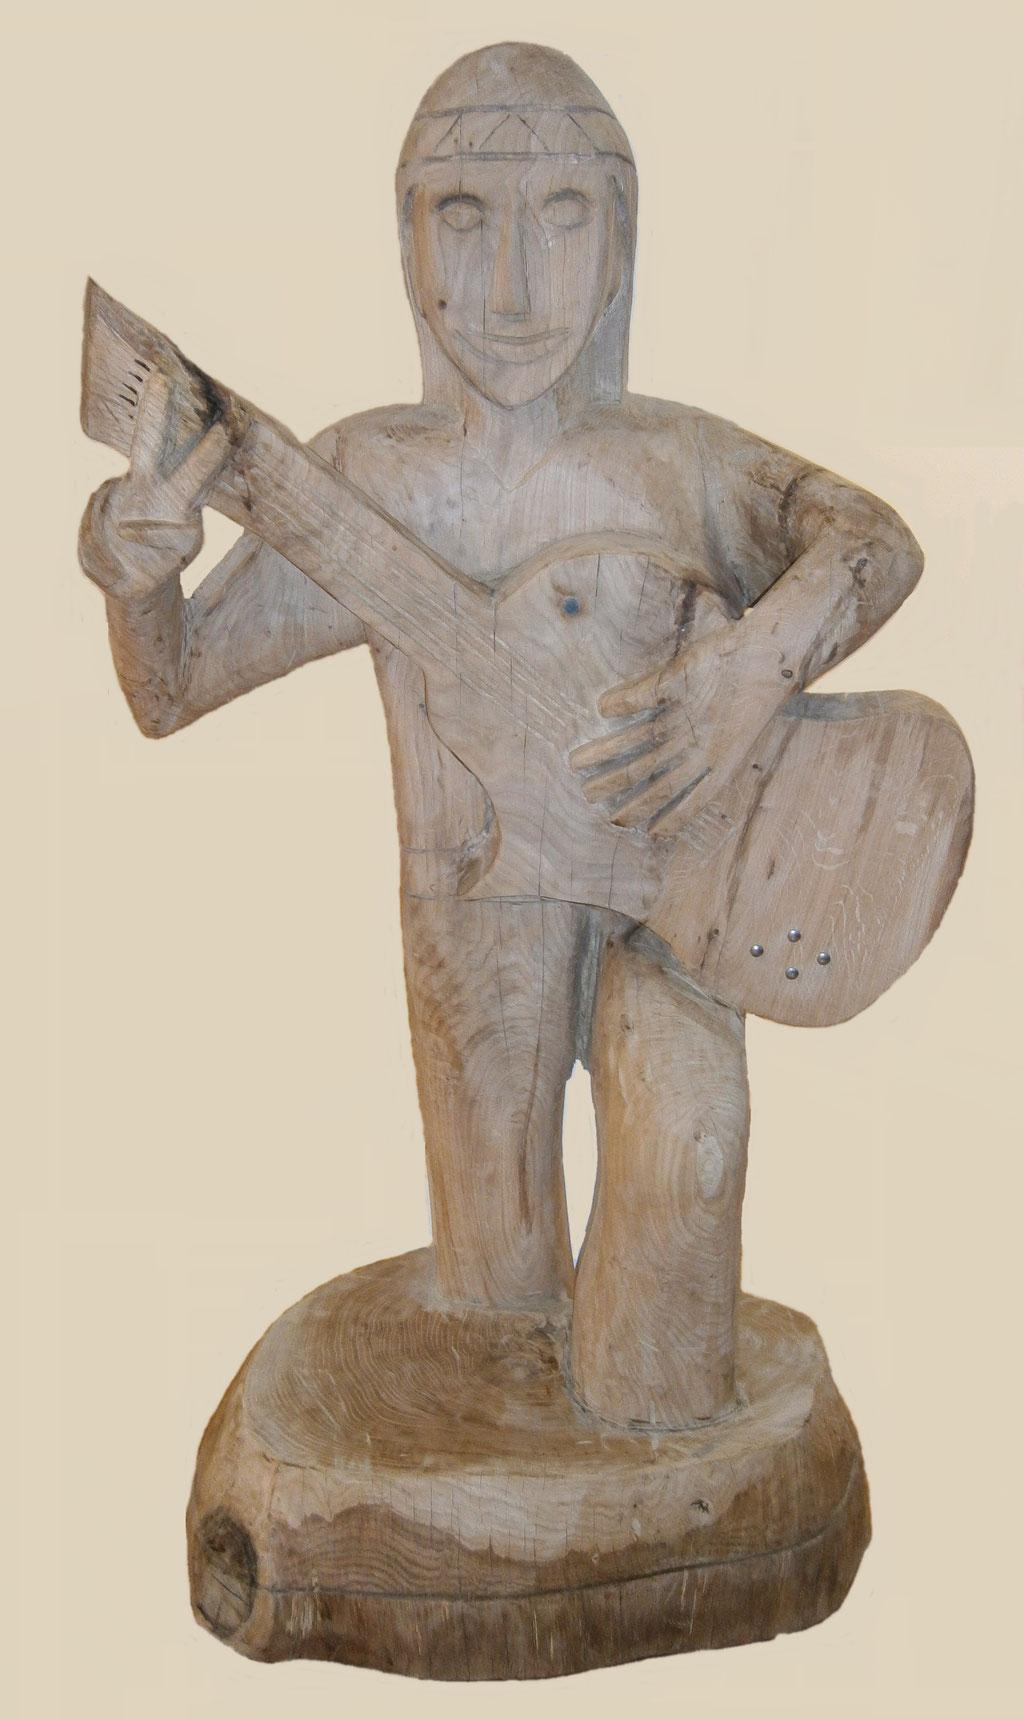 Der Gitarrrenspieler